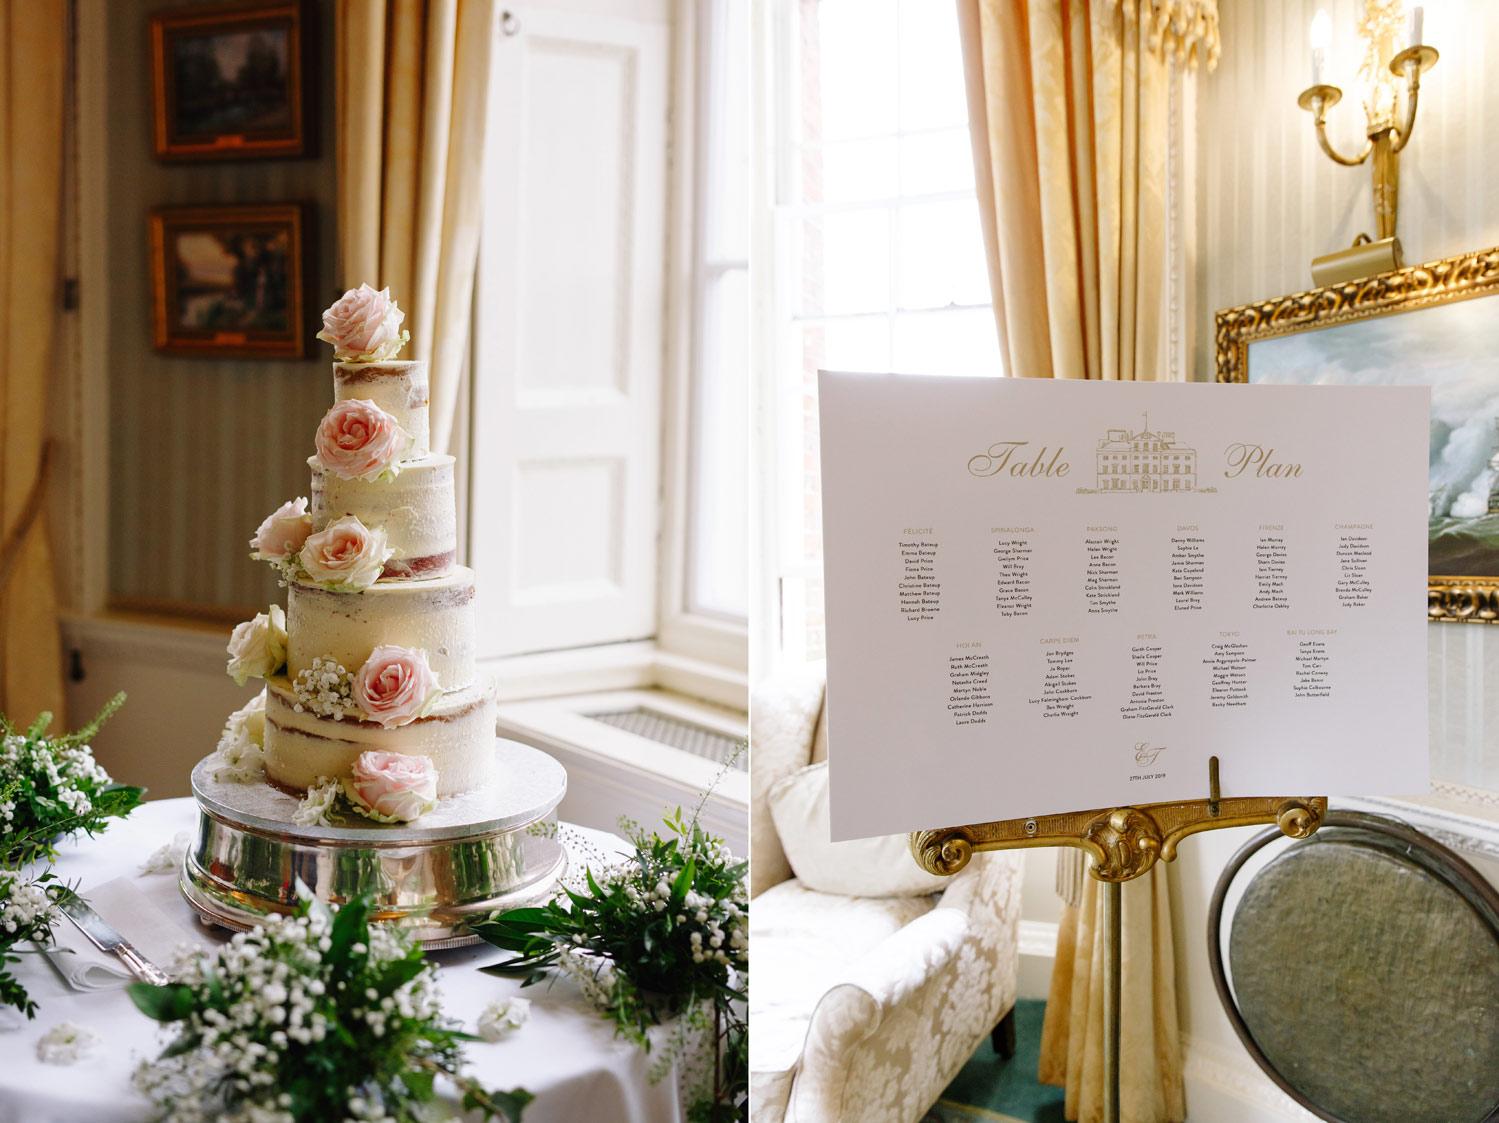 A wedding cake at Brocket Hall